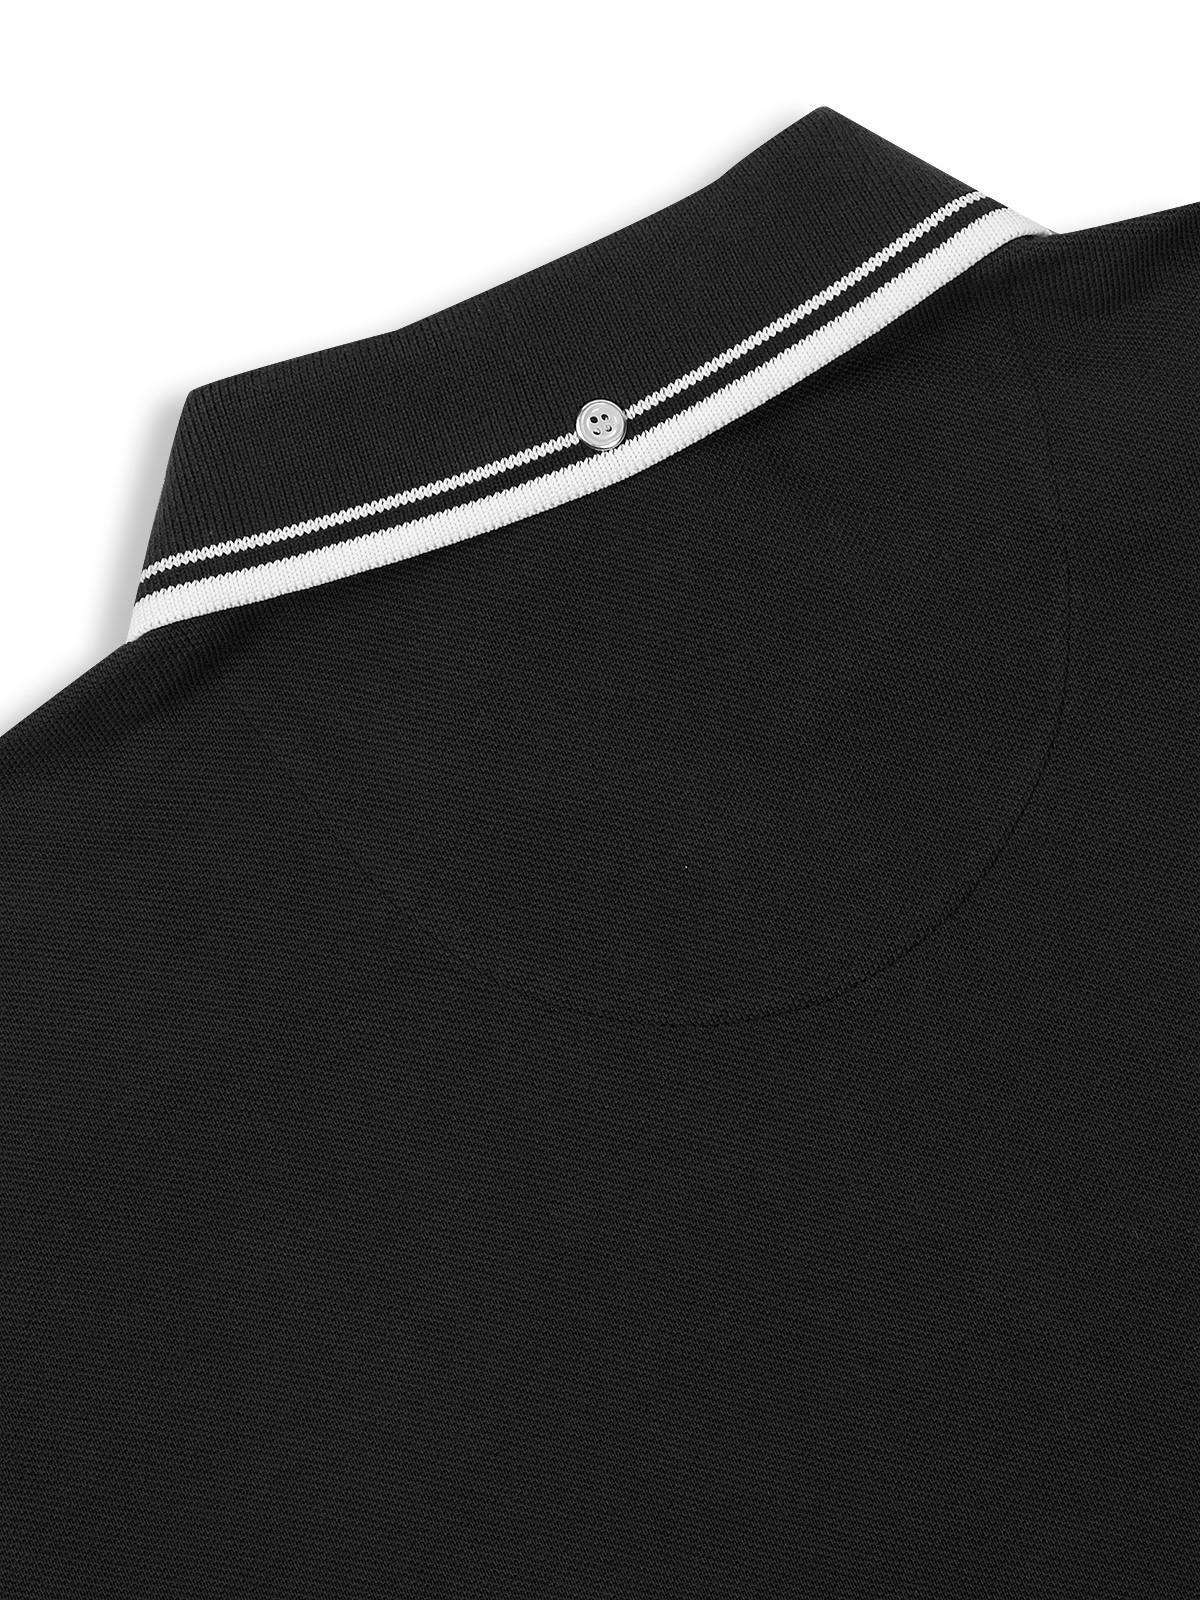 Рубашка поло mc10146/b32/mf1 BEN SHERMAN Polo